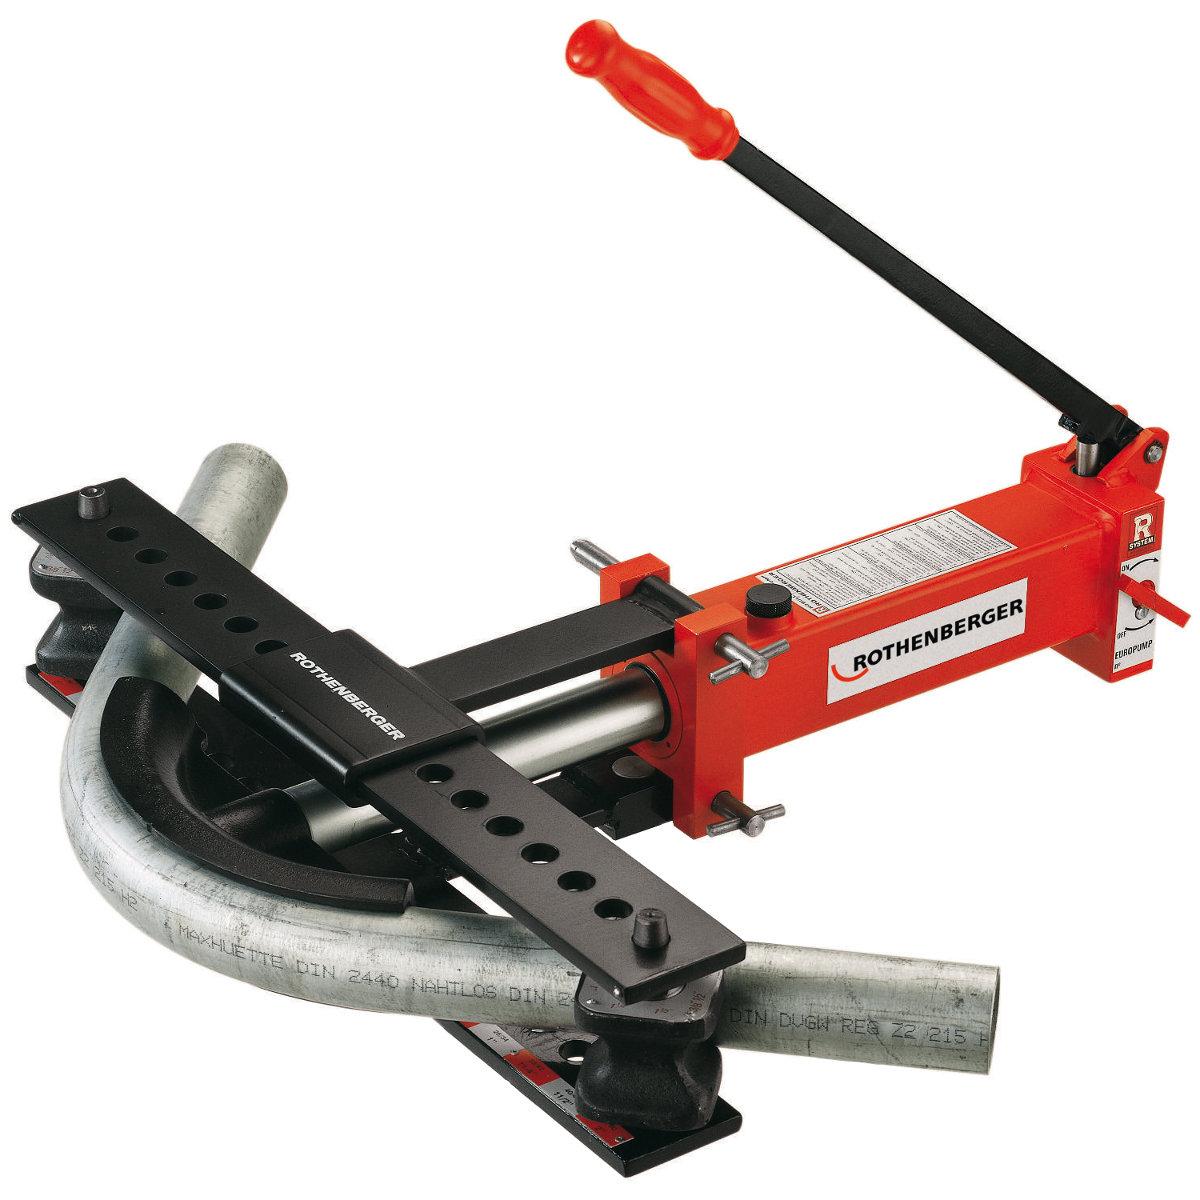 Pipe Bender Hydraulic 1 2in 2in Wellers Hire